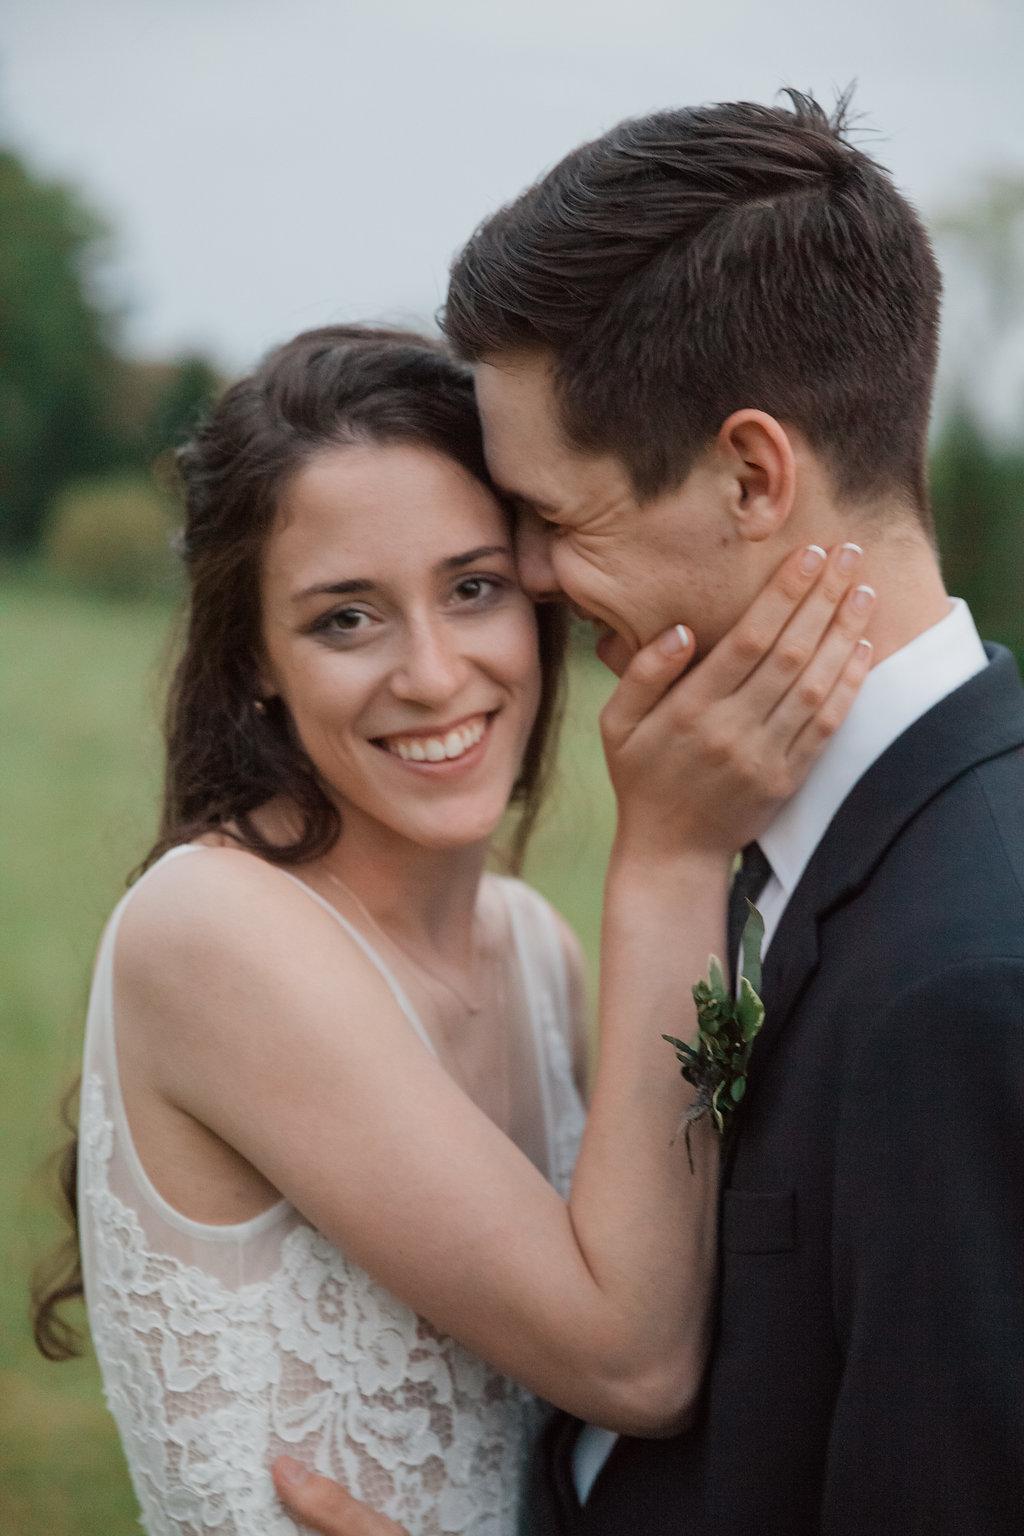 Honeysuckle-Hill-Weddings-Mallory-Patrick-124.jpg